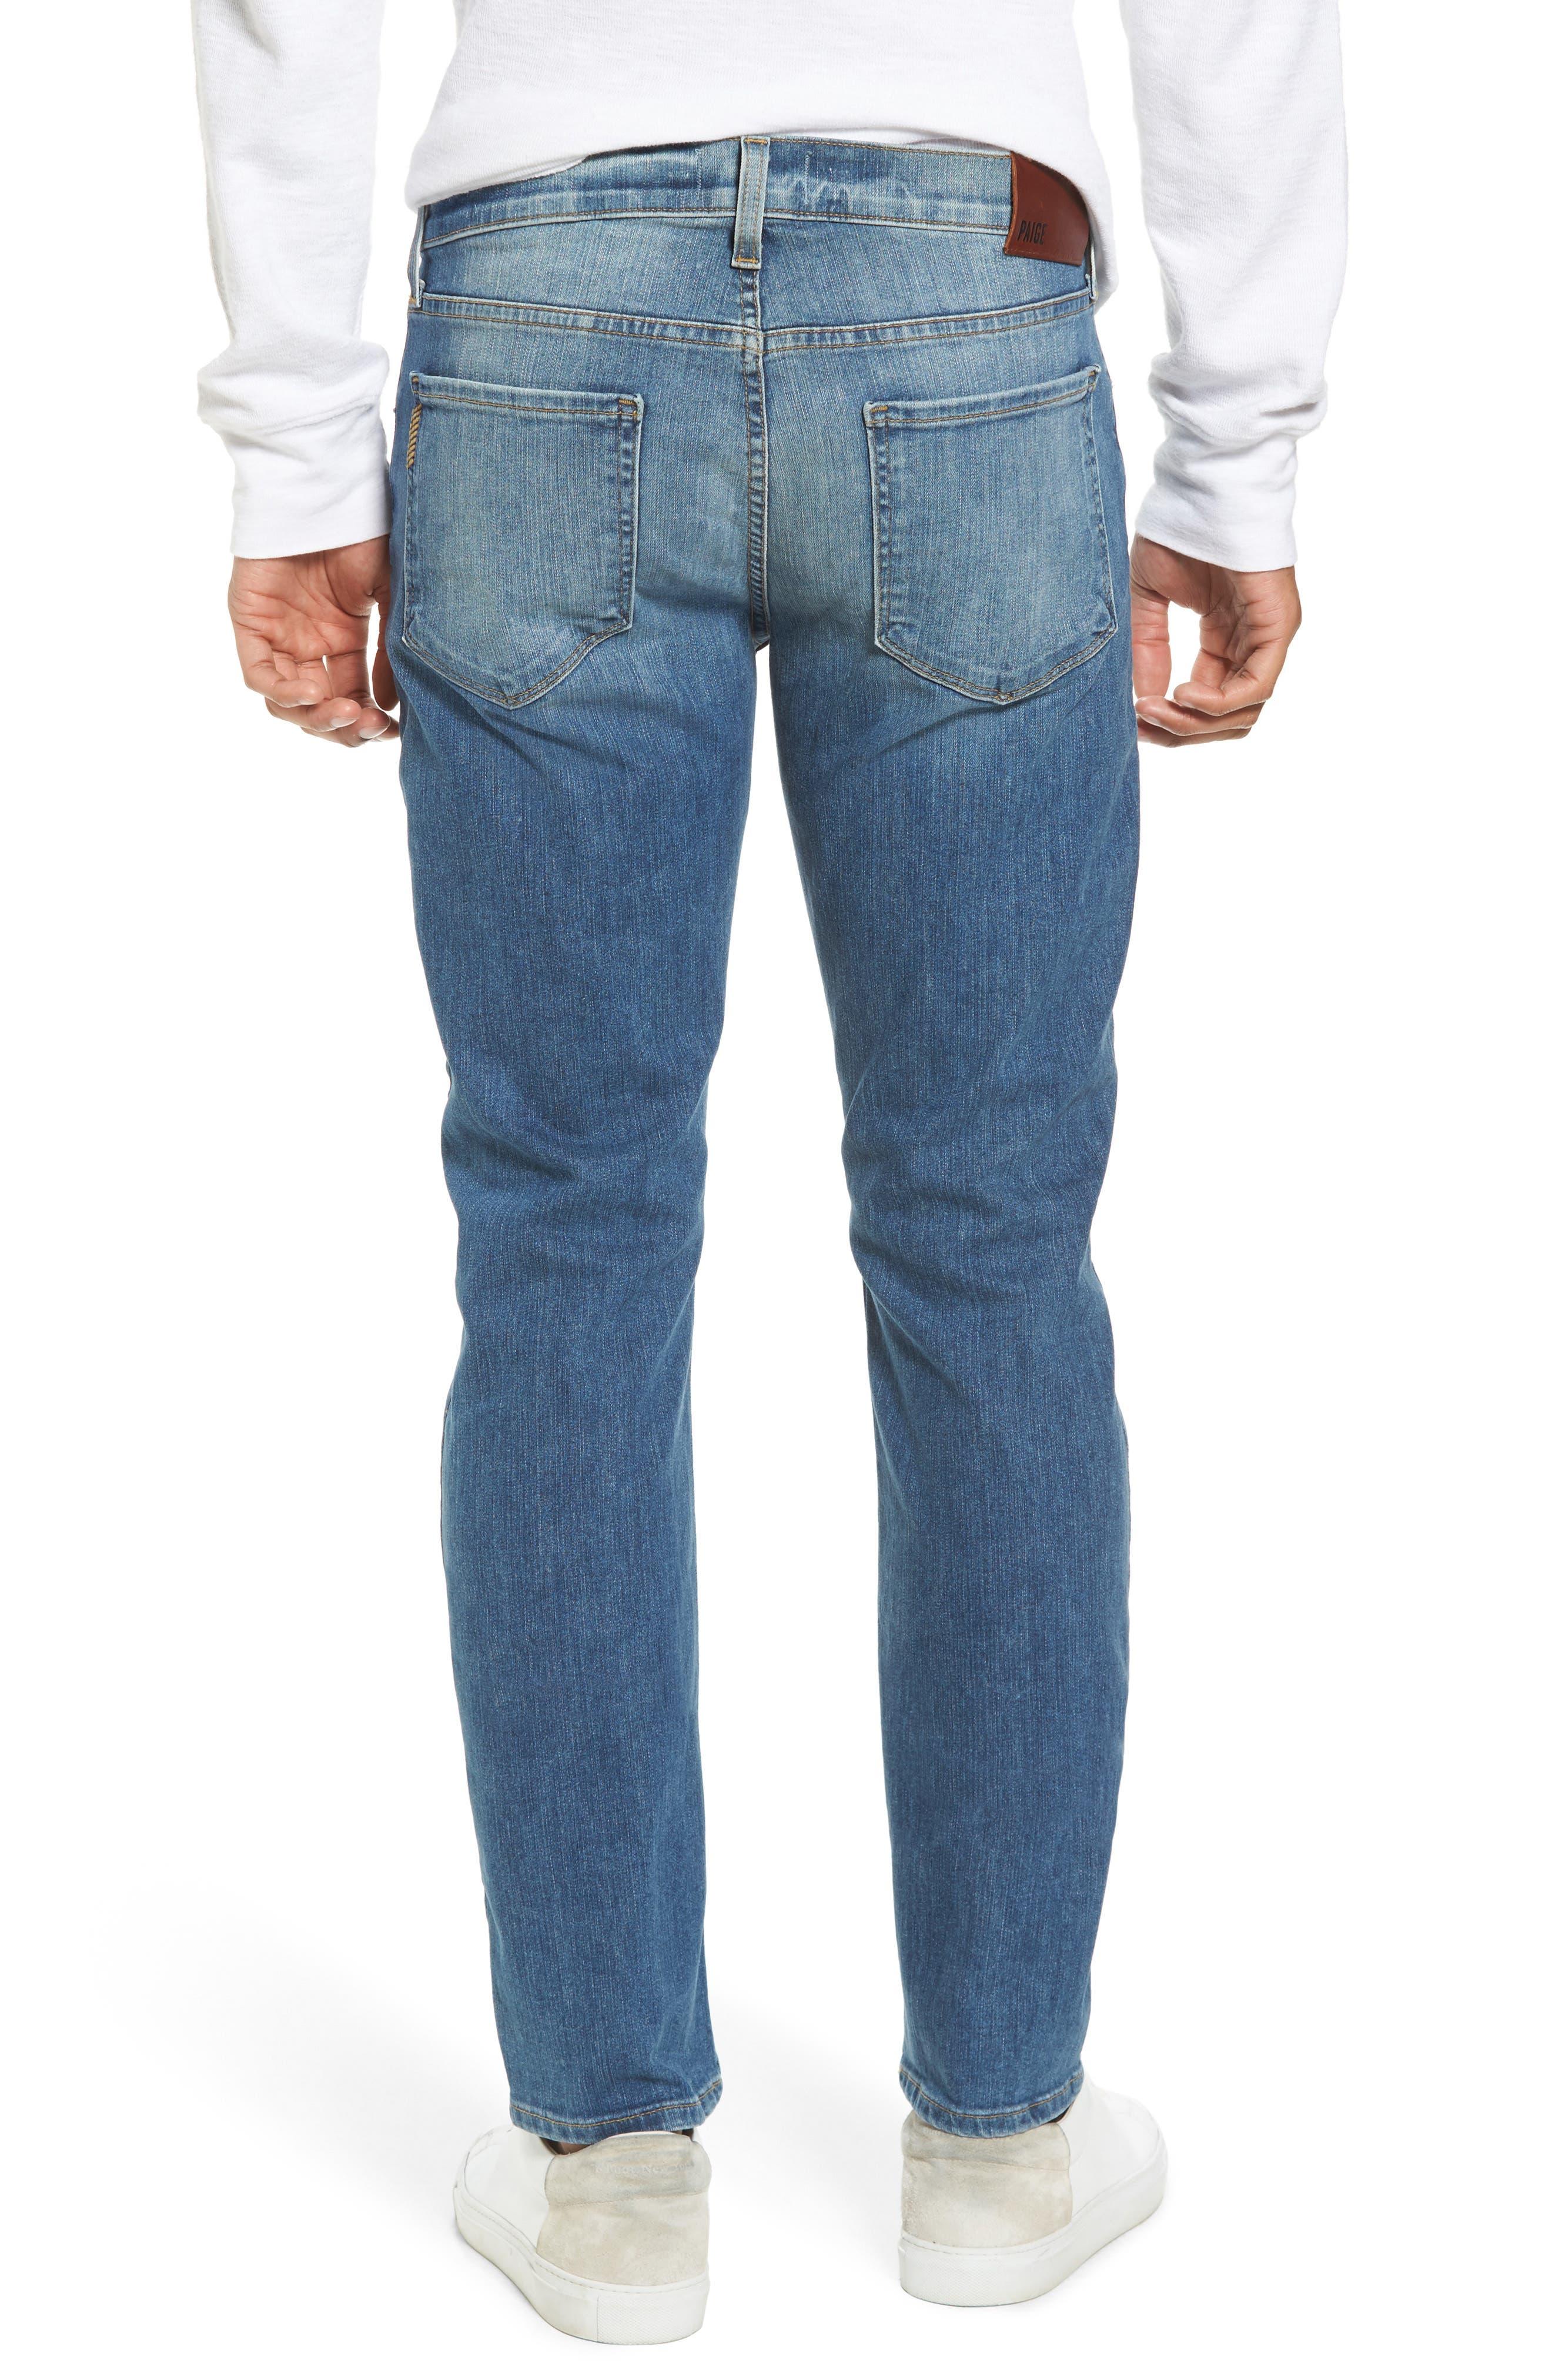 Legacy - Lennox Slim Fit Jeans,                             Alternate thumbnail 2, color,                             STEELE